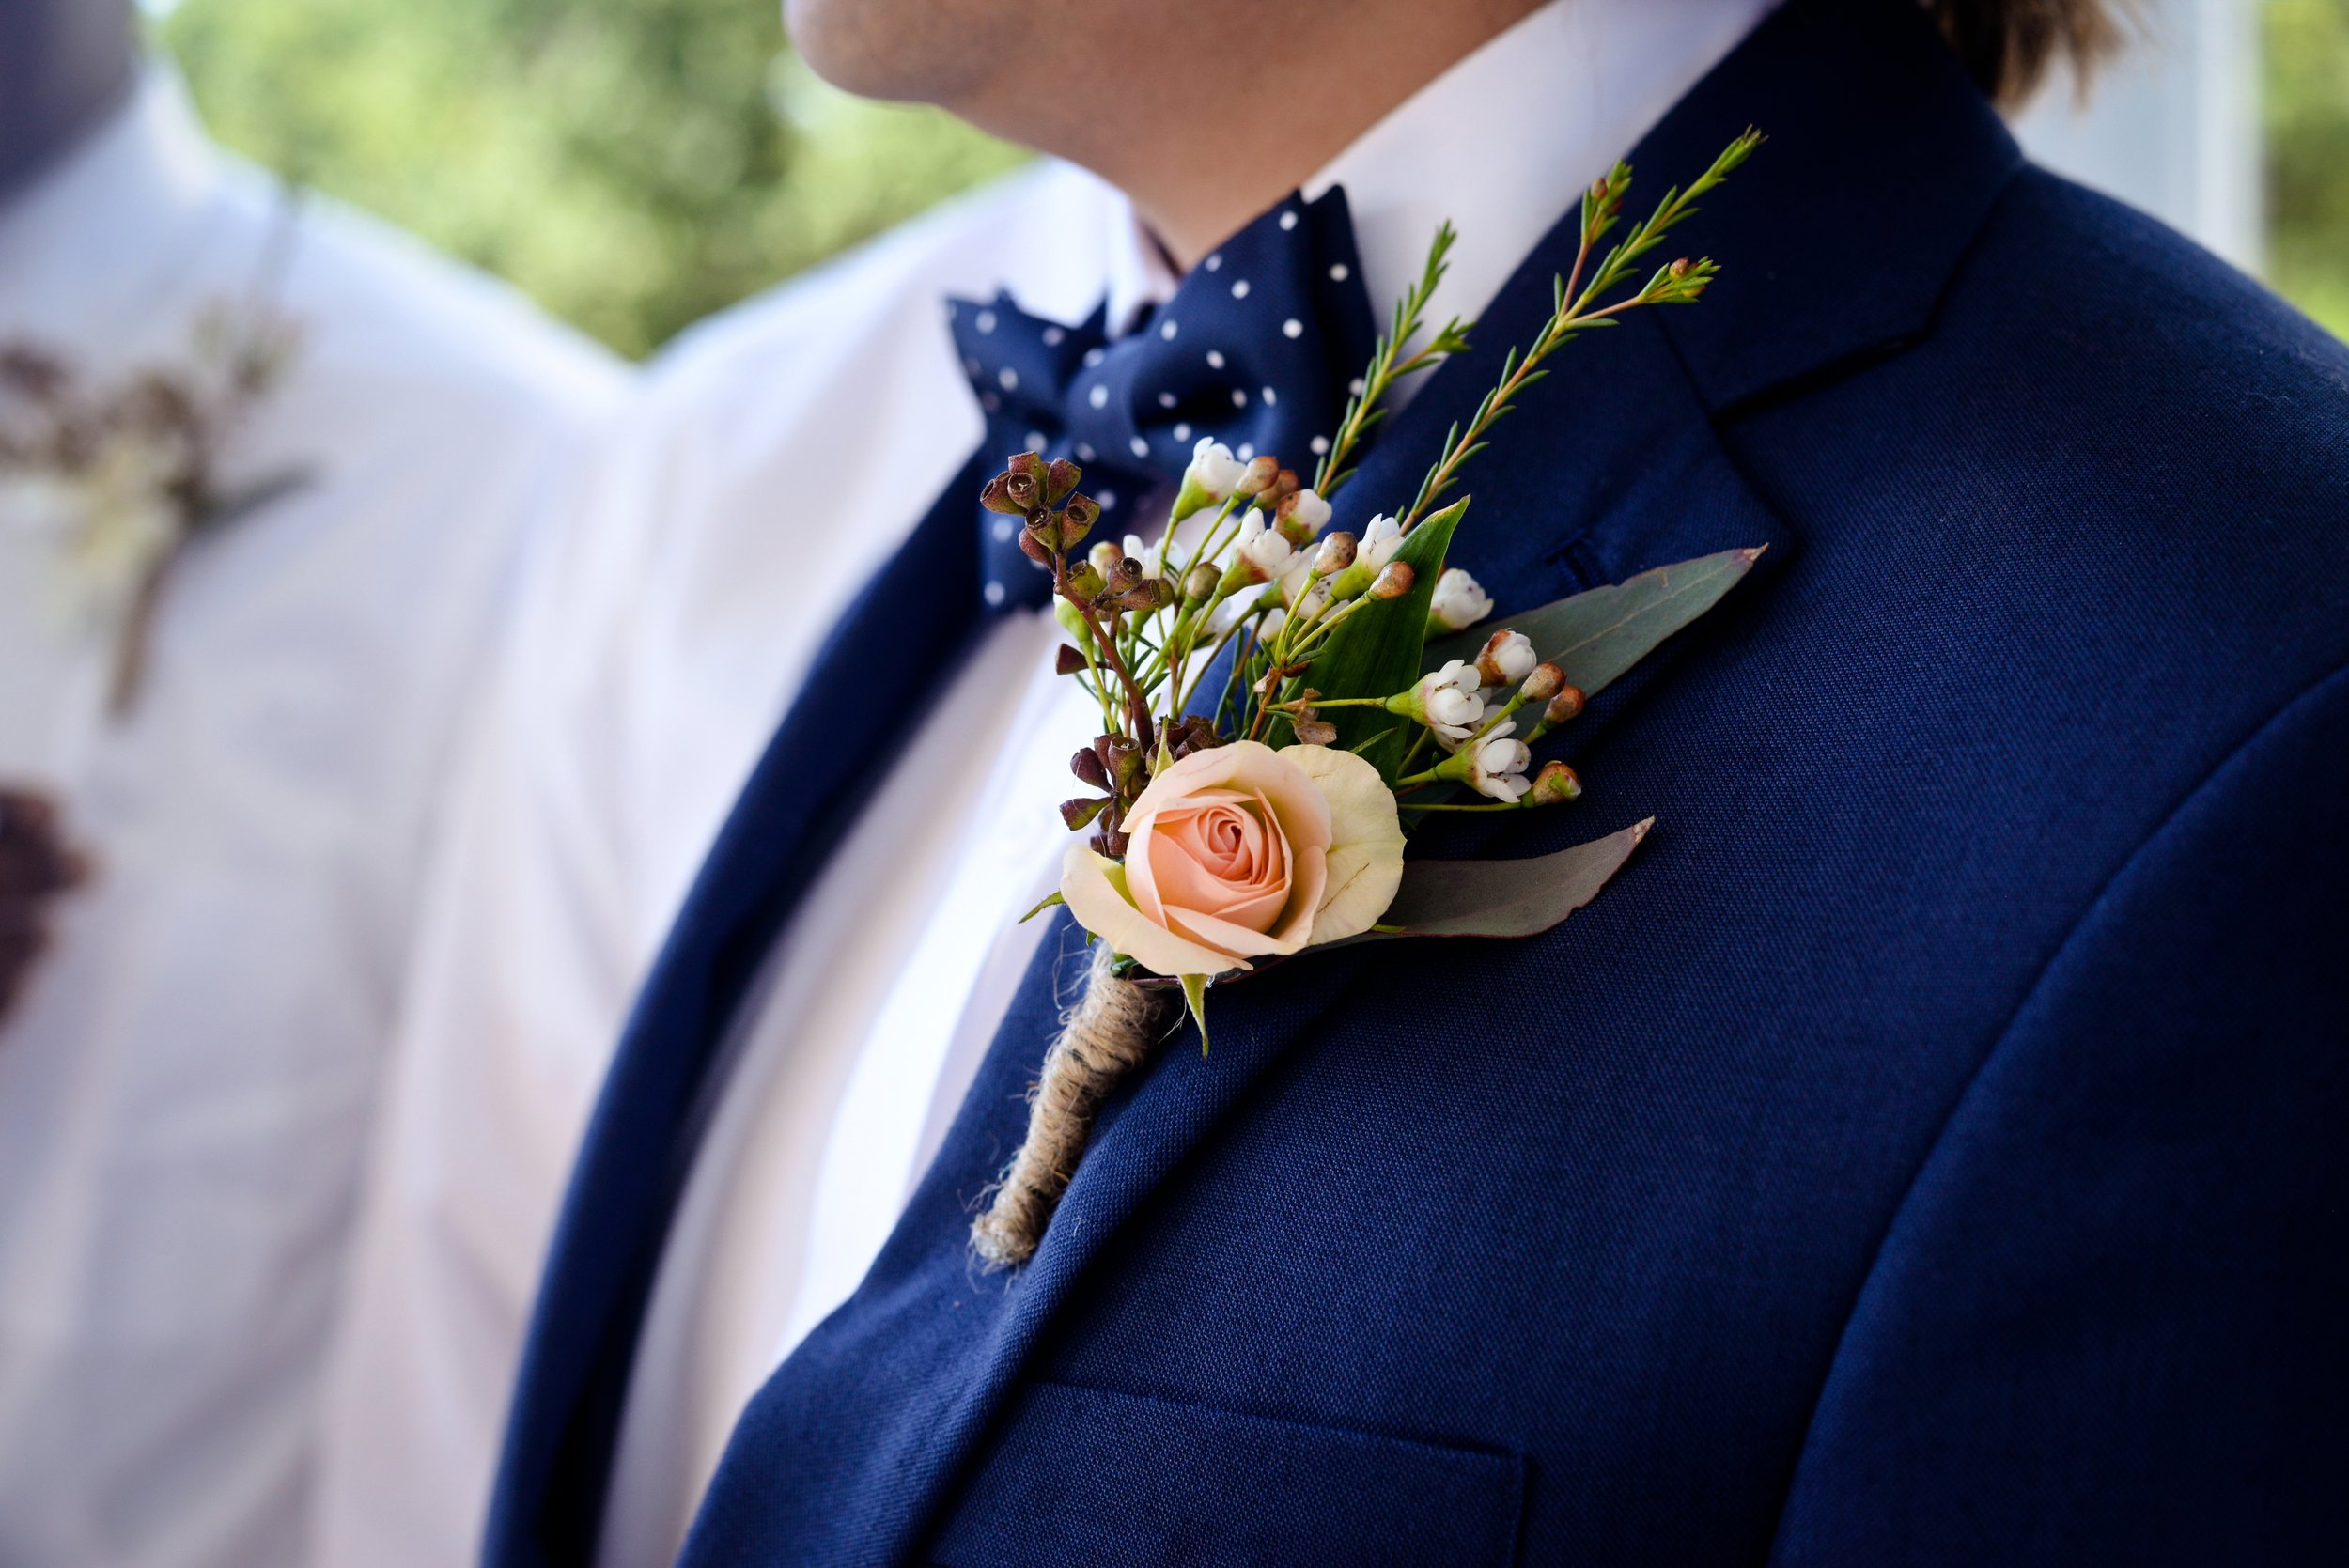 Lonestar-Mansion-Fort-Worth-Wedding-Planner-Burleson-Wedding-Venue_15.jpg